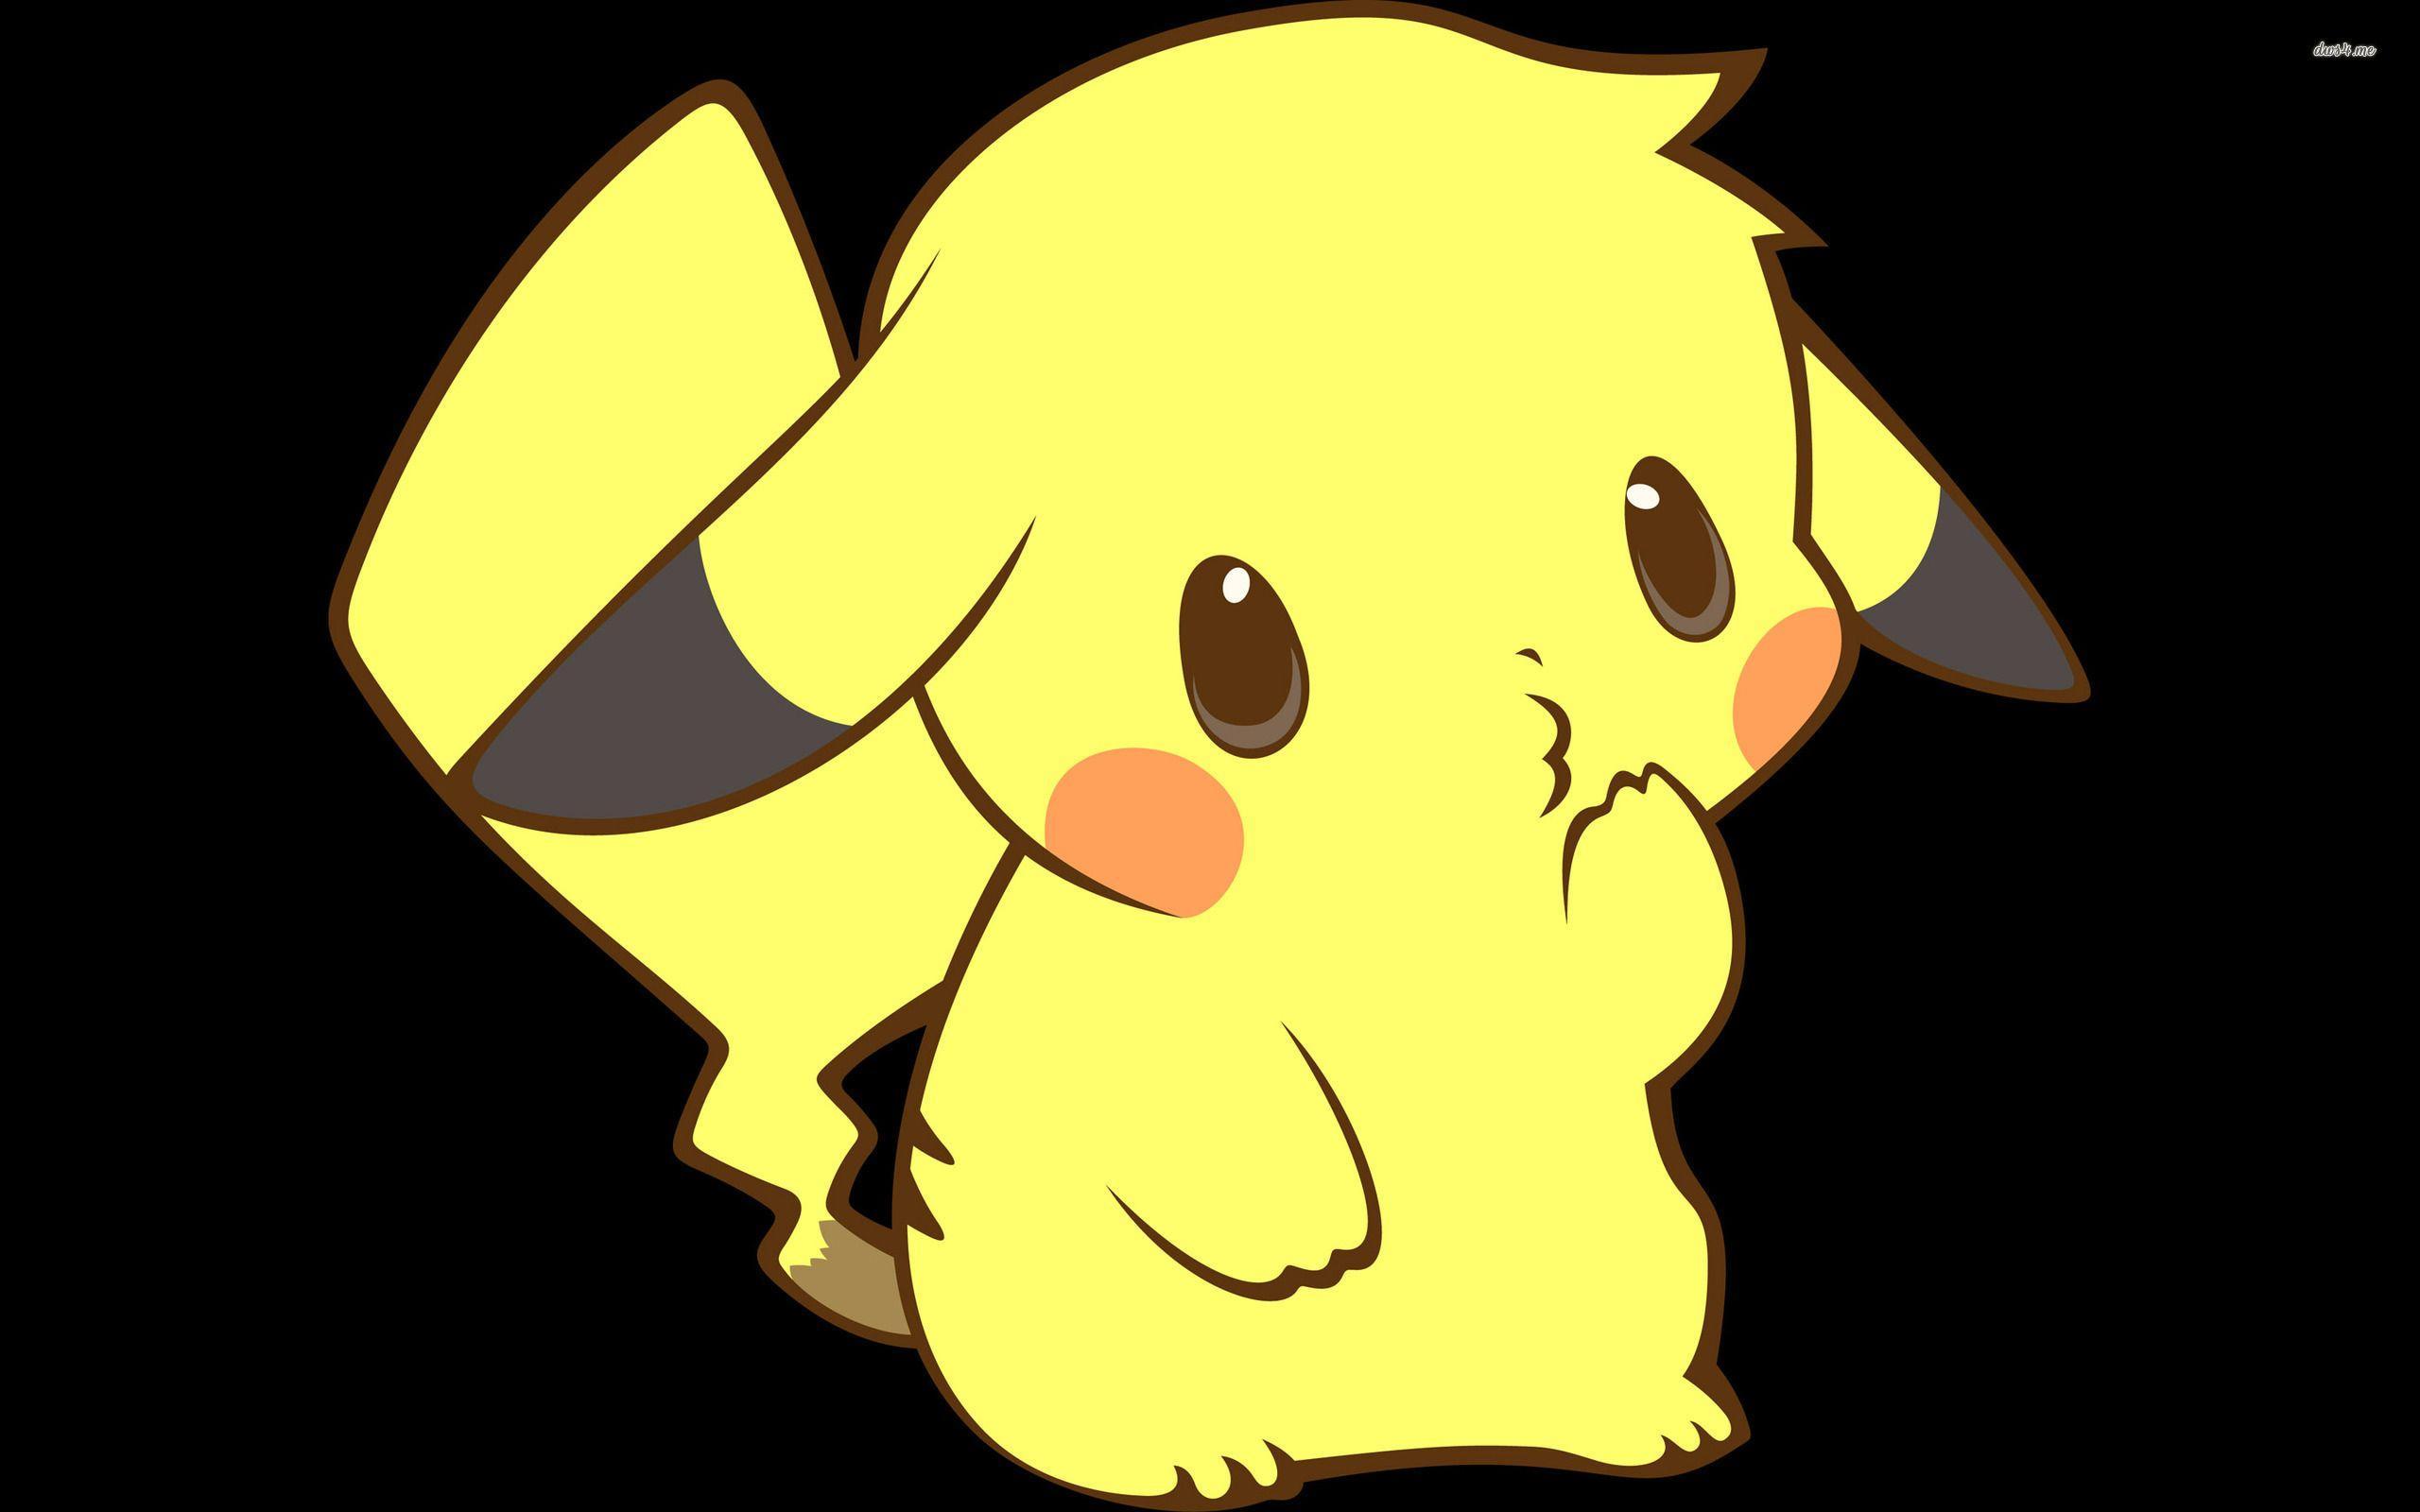 Pikachu Hd Wallpapers Wallpaper Cave